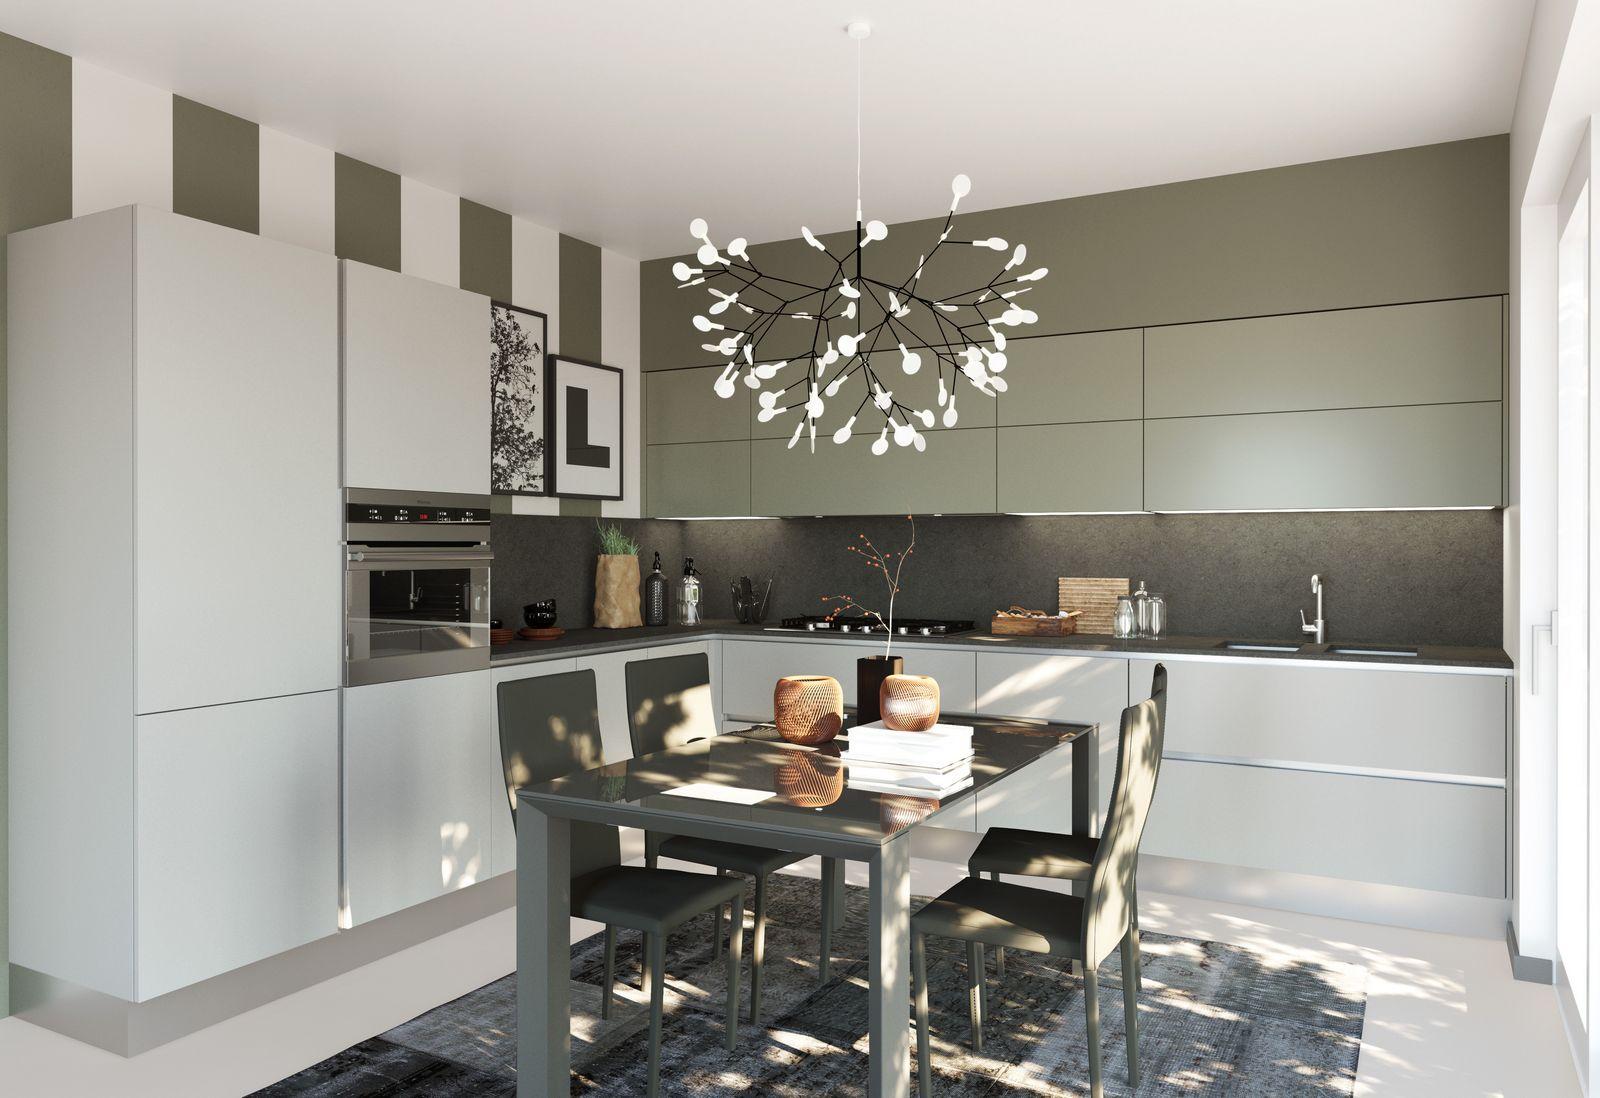 Stunning Cucine Angolari Piccole Dimensioni Pictures - Ideas ...